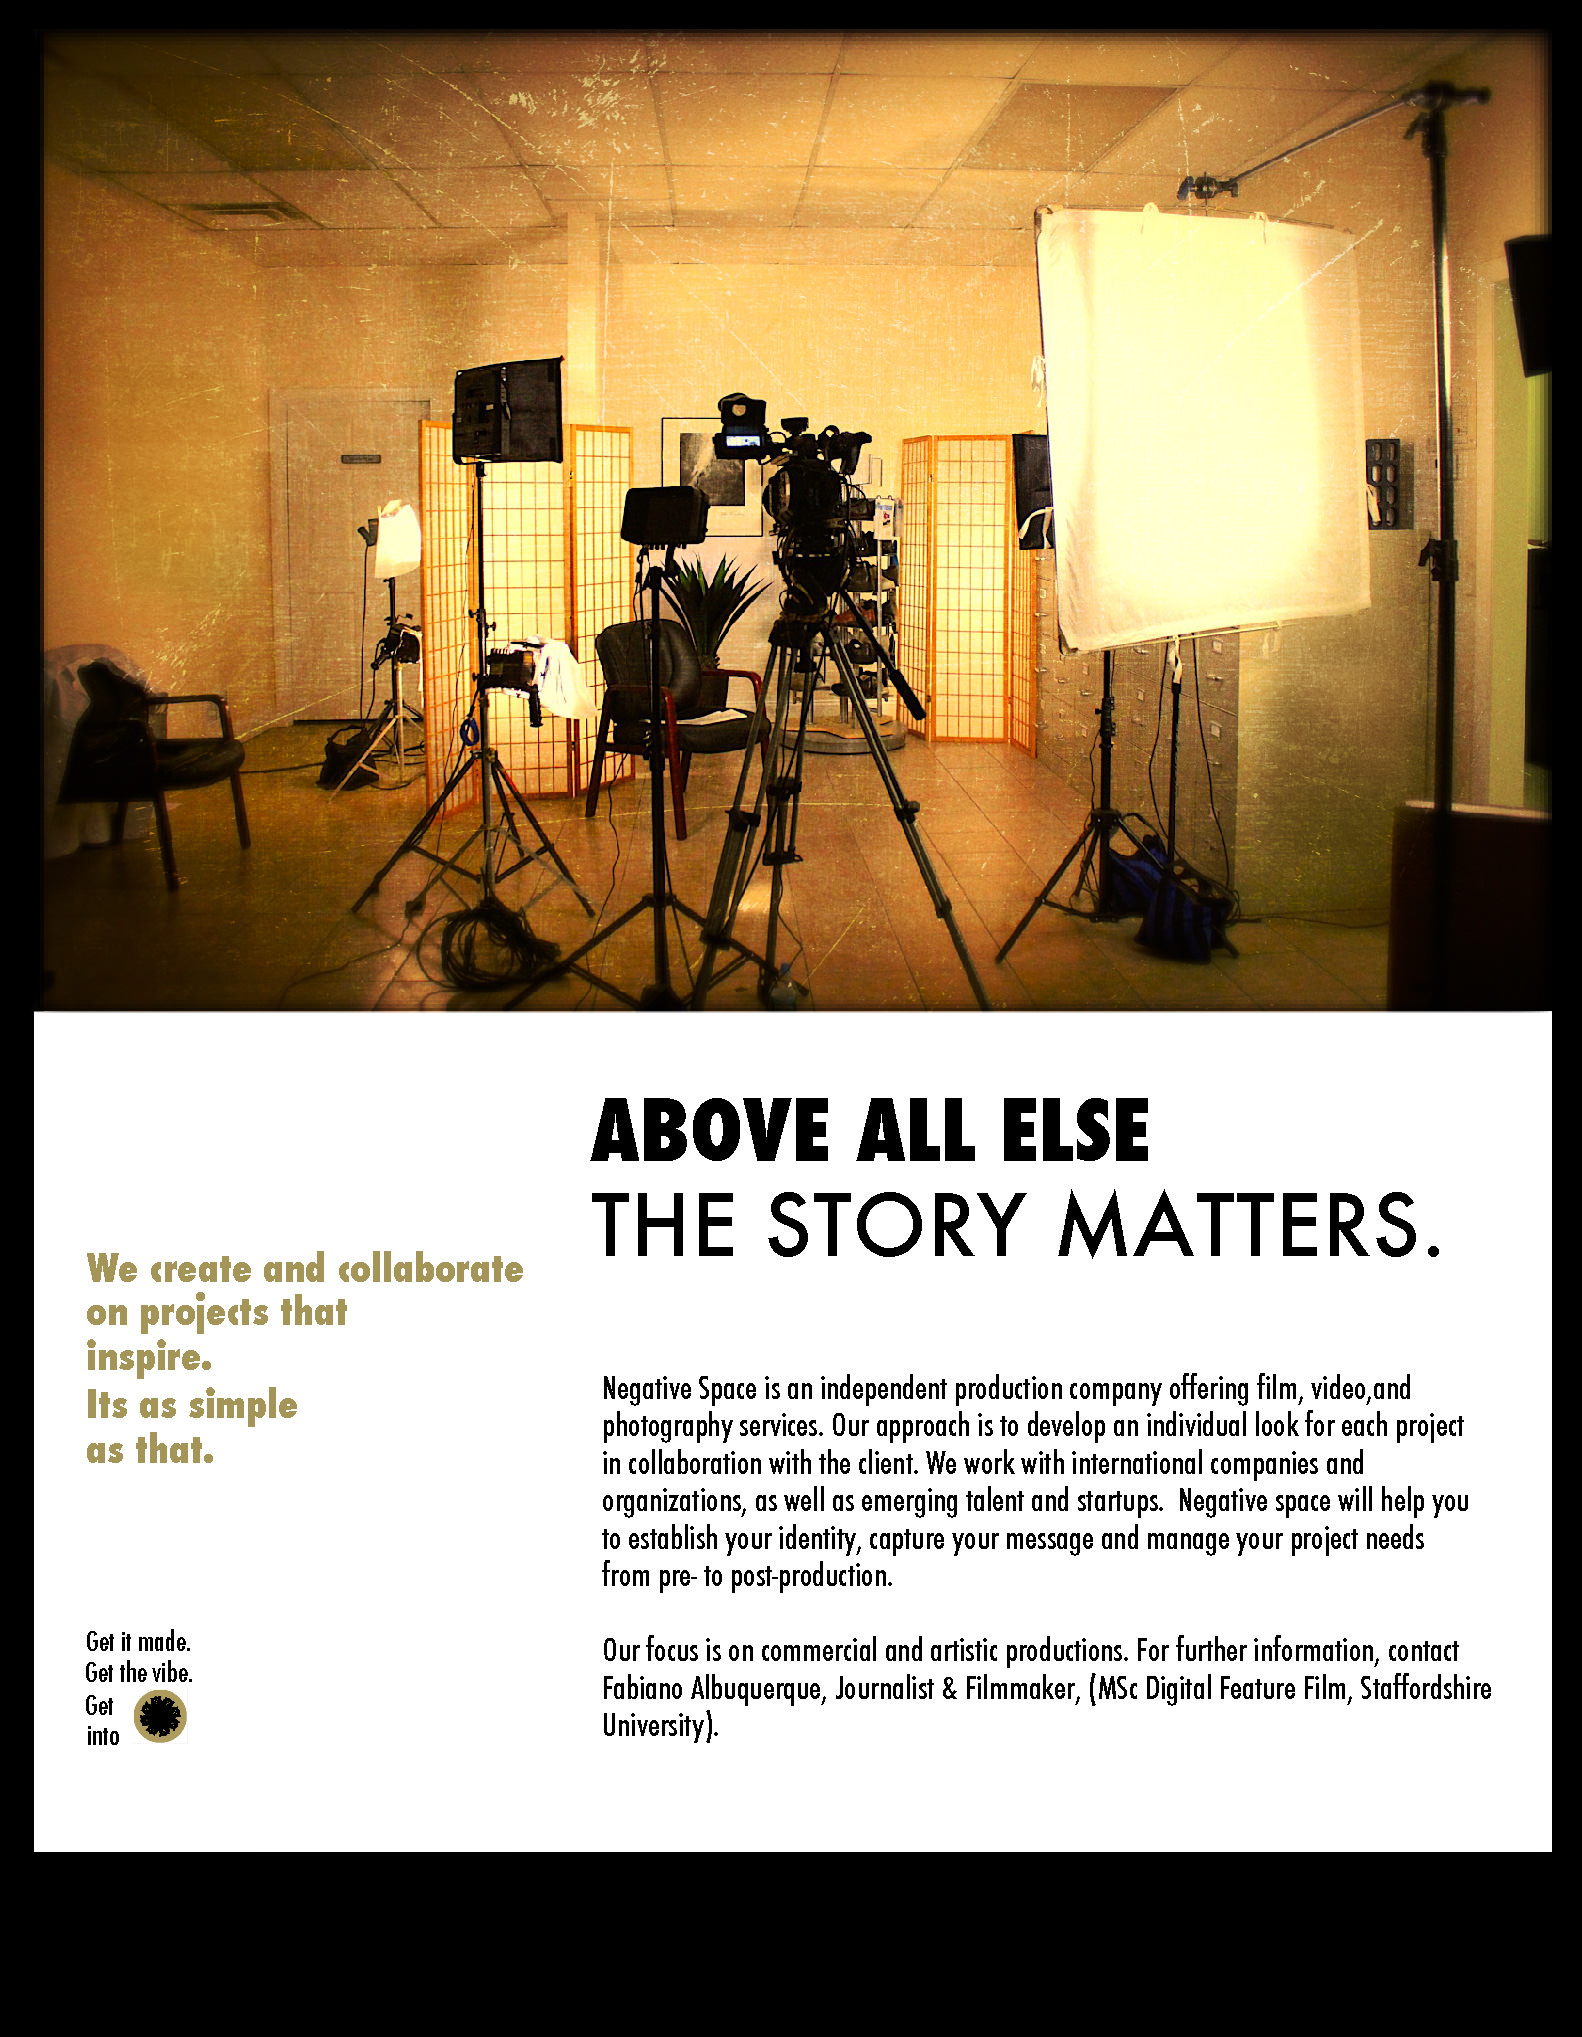 video production, video promo production, video company, videographer, videography dublin, videography ireland, film production, corporate video produciton, corporate video production, promotional video